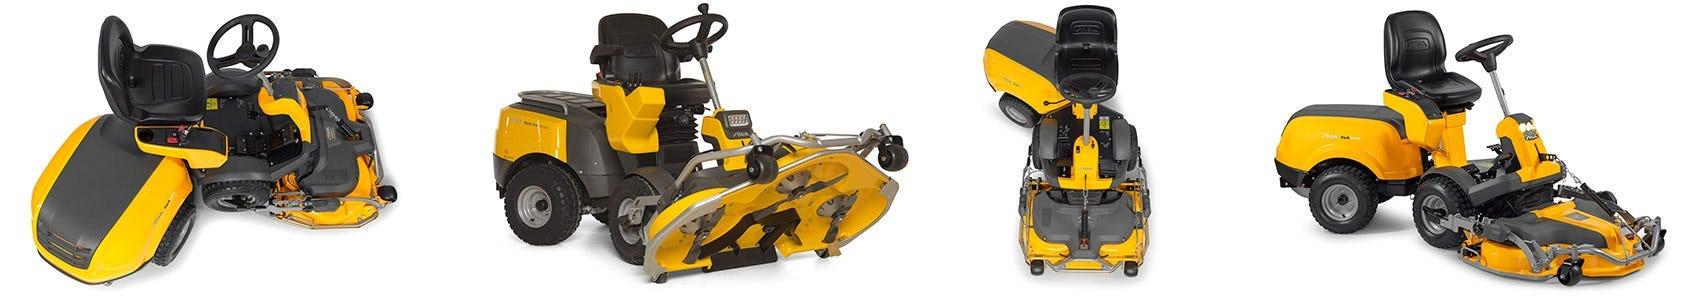 STIGA frontmonterede ridere er kraftfulde maskiner, som er perfekte til Multiclip